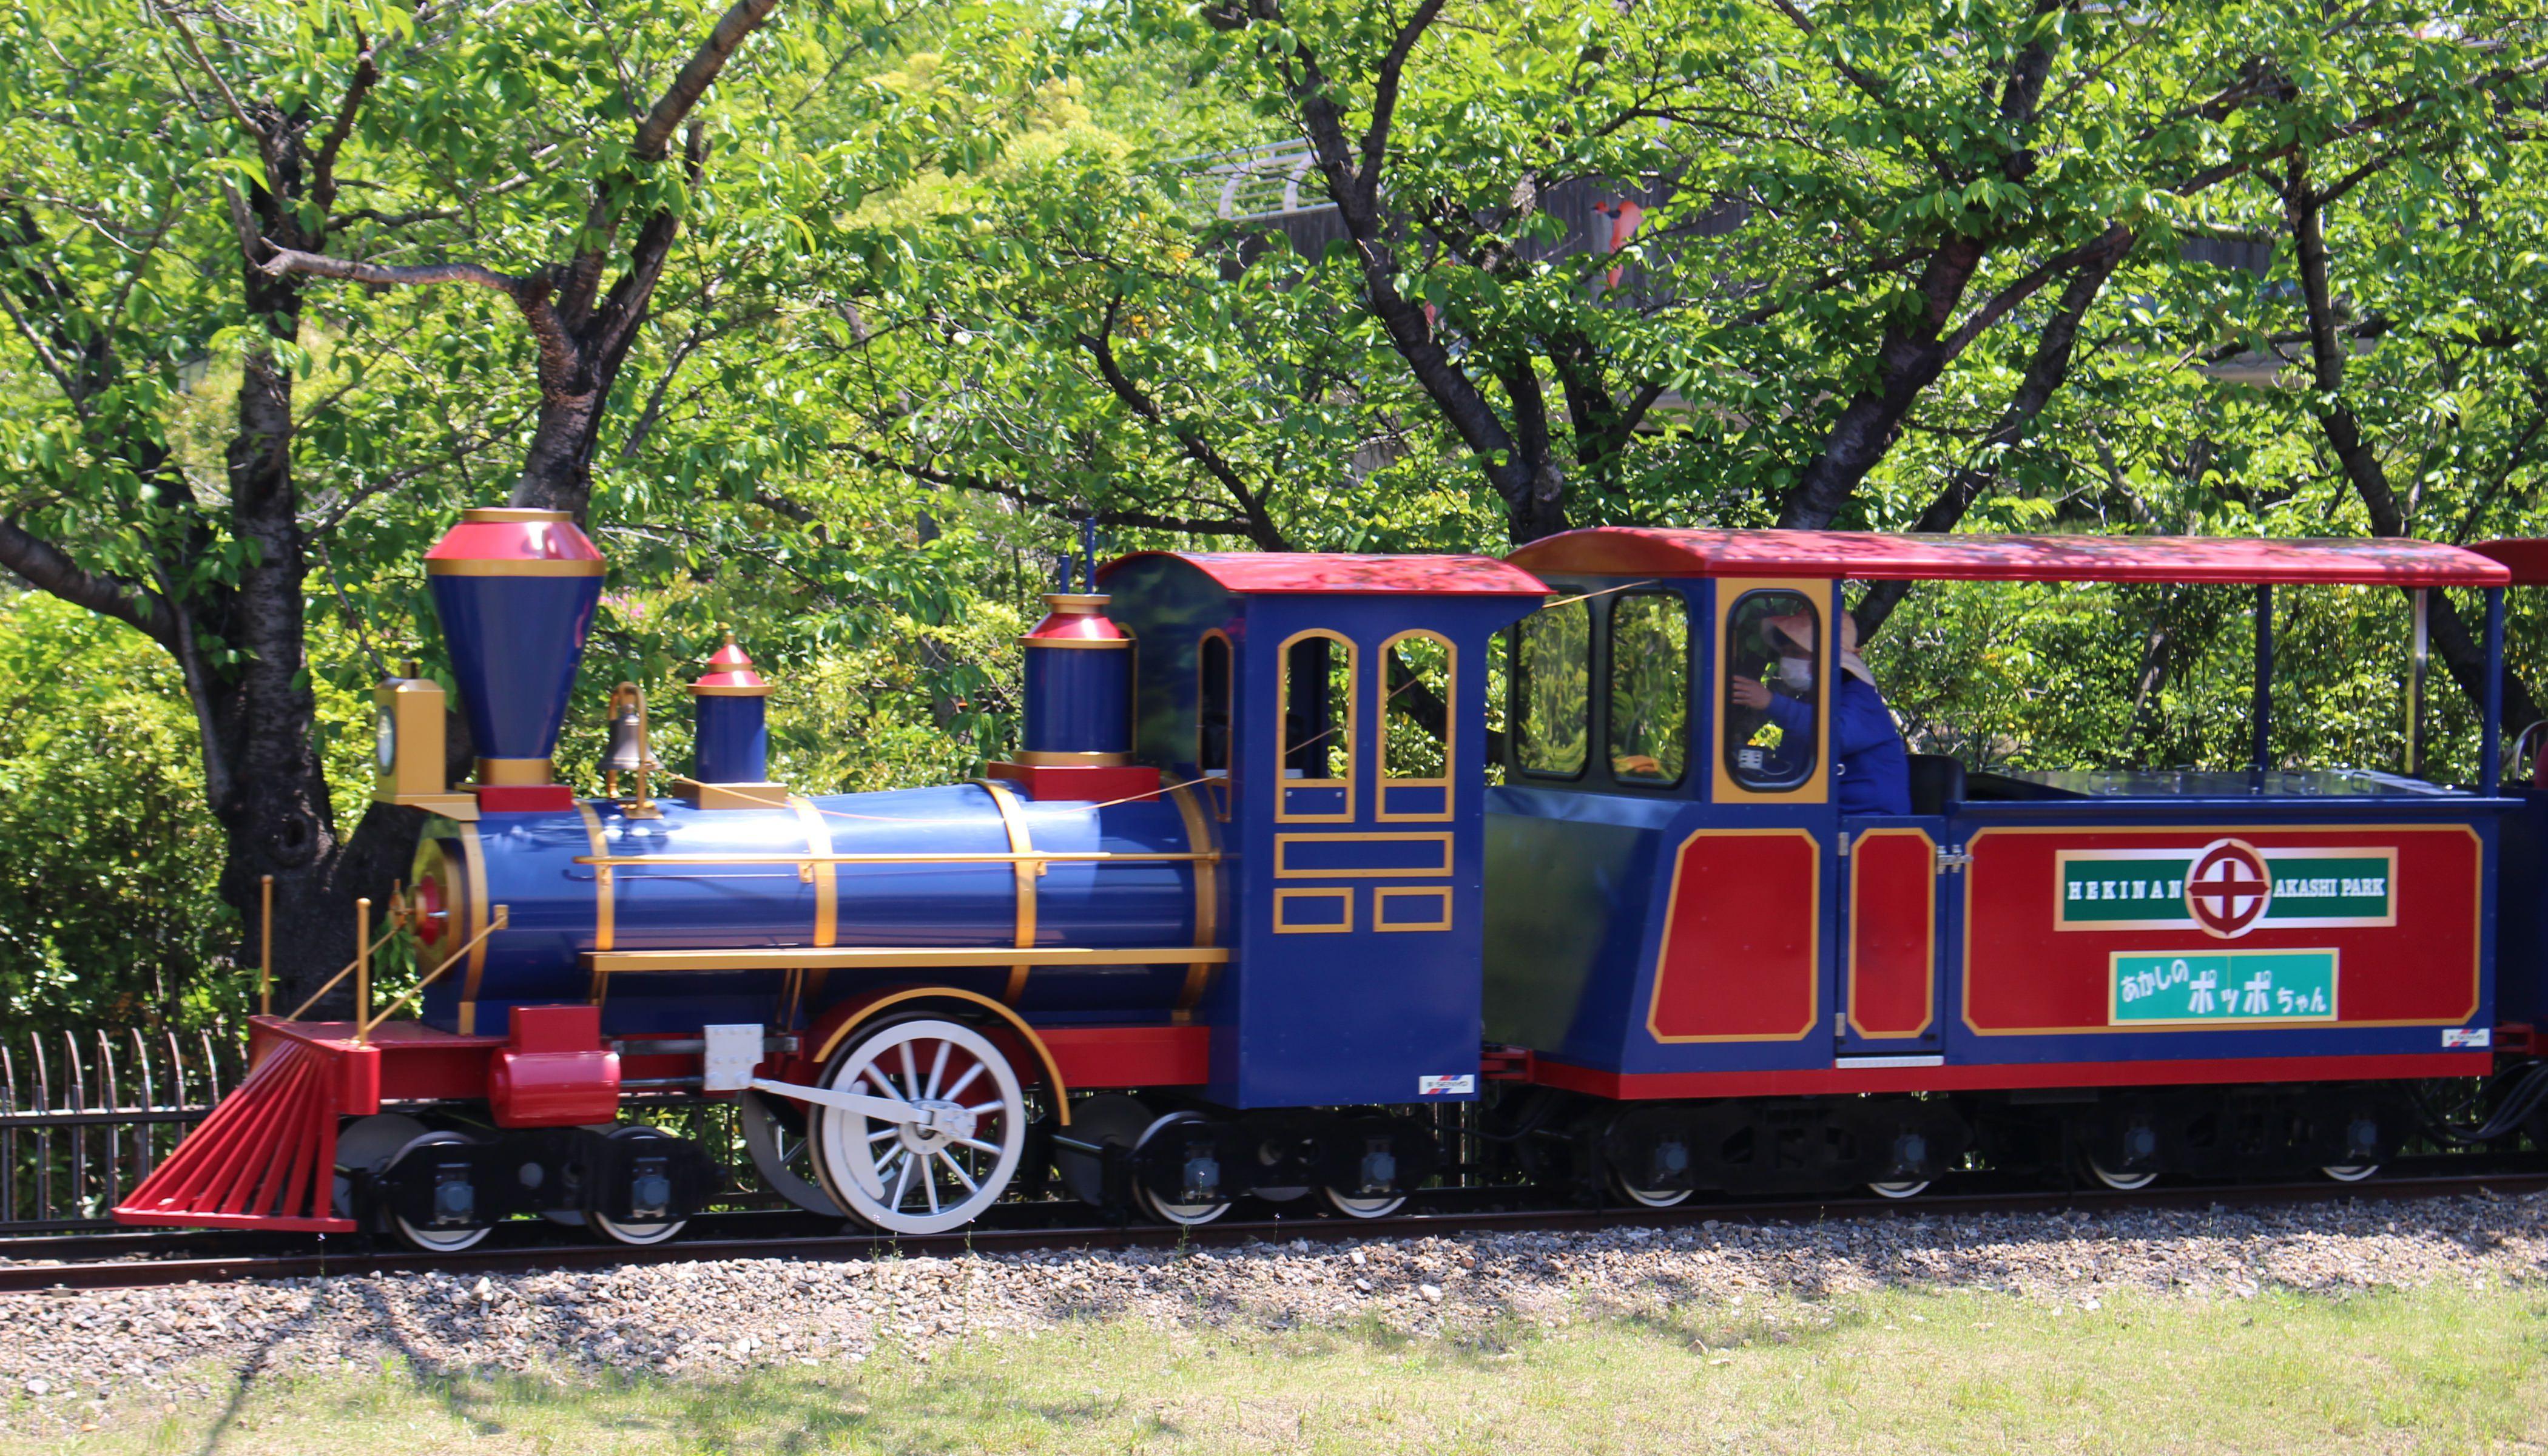 The Park Train